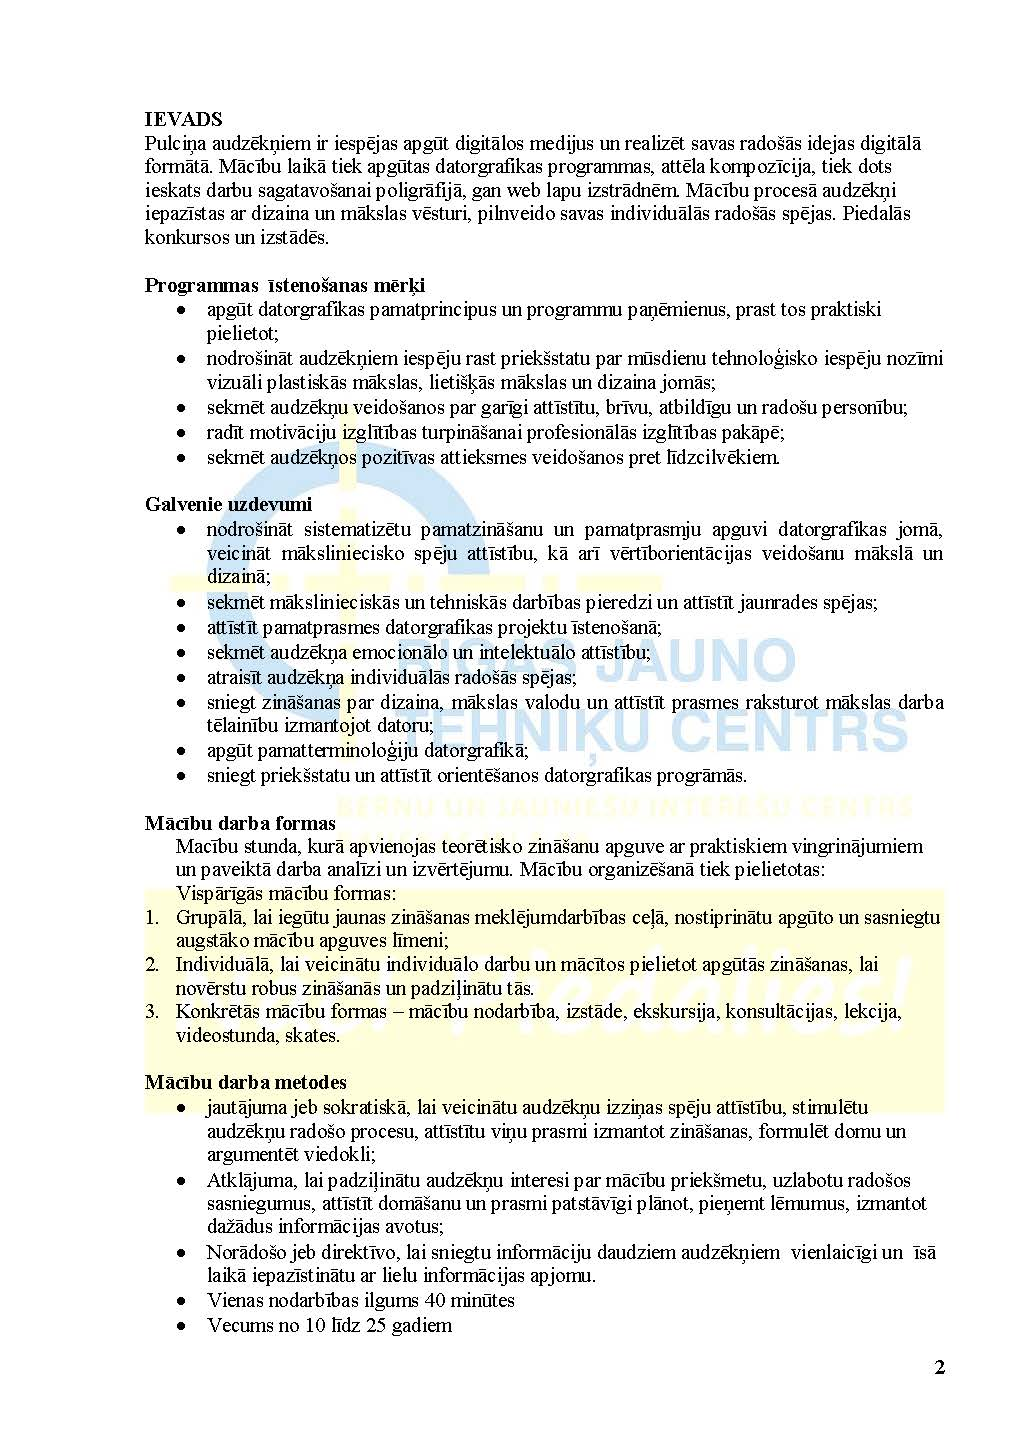 datorgrafikas-programma_page_2